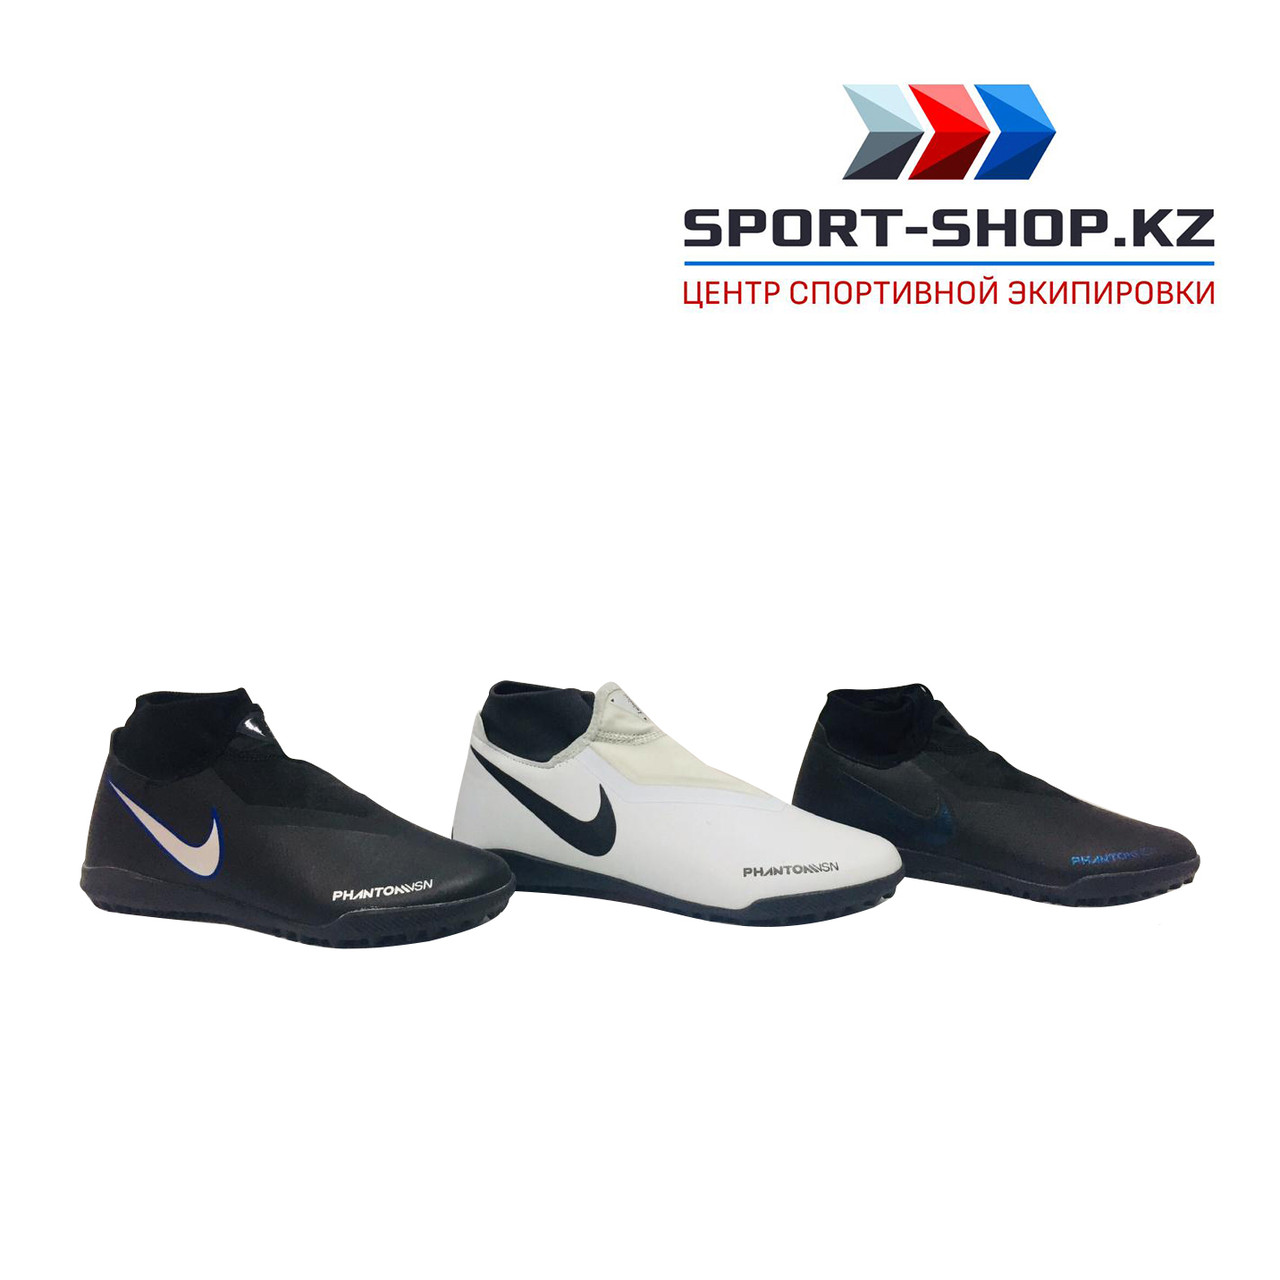 СОРОКОНОЖКИ NIKE (Nike Phantom Vsn) с носком